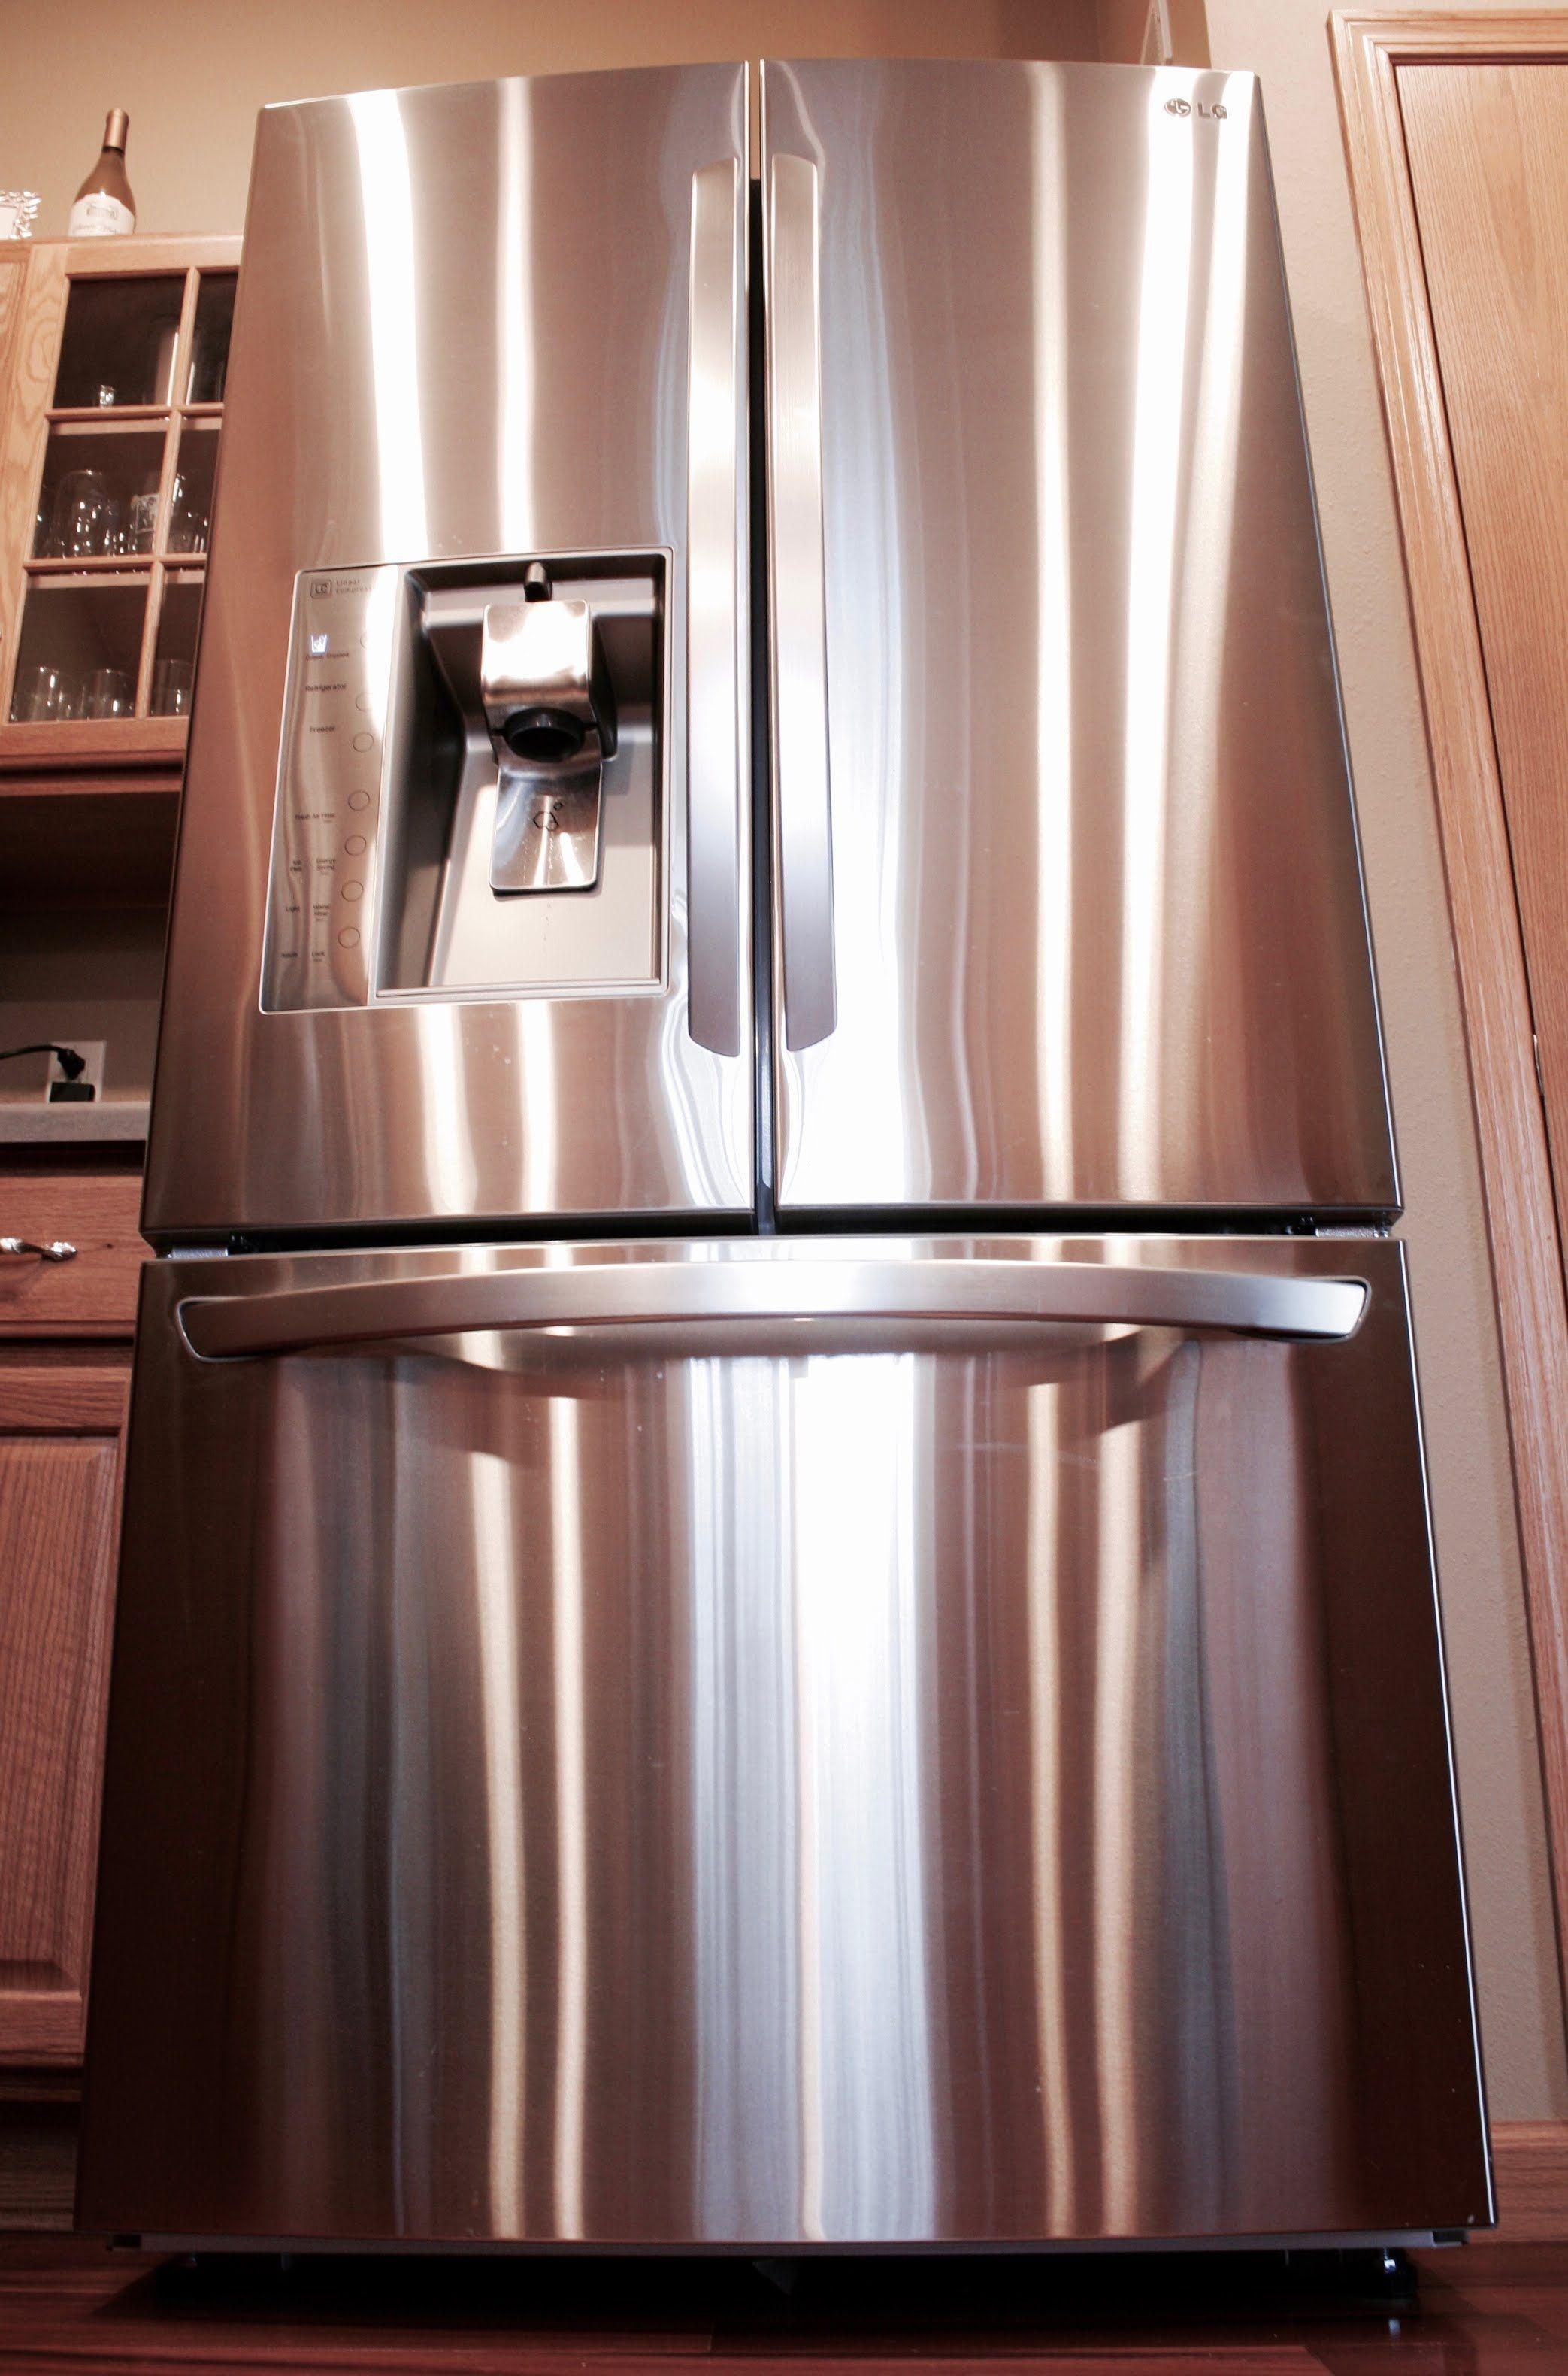 Lg Lfx31925st French Door Refrigerator Review 31562509 Choosing A